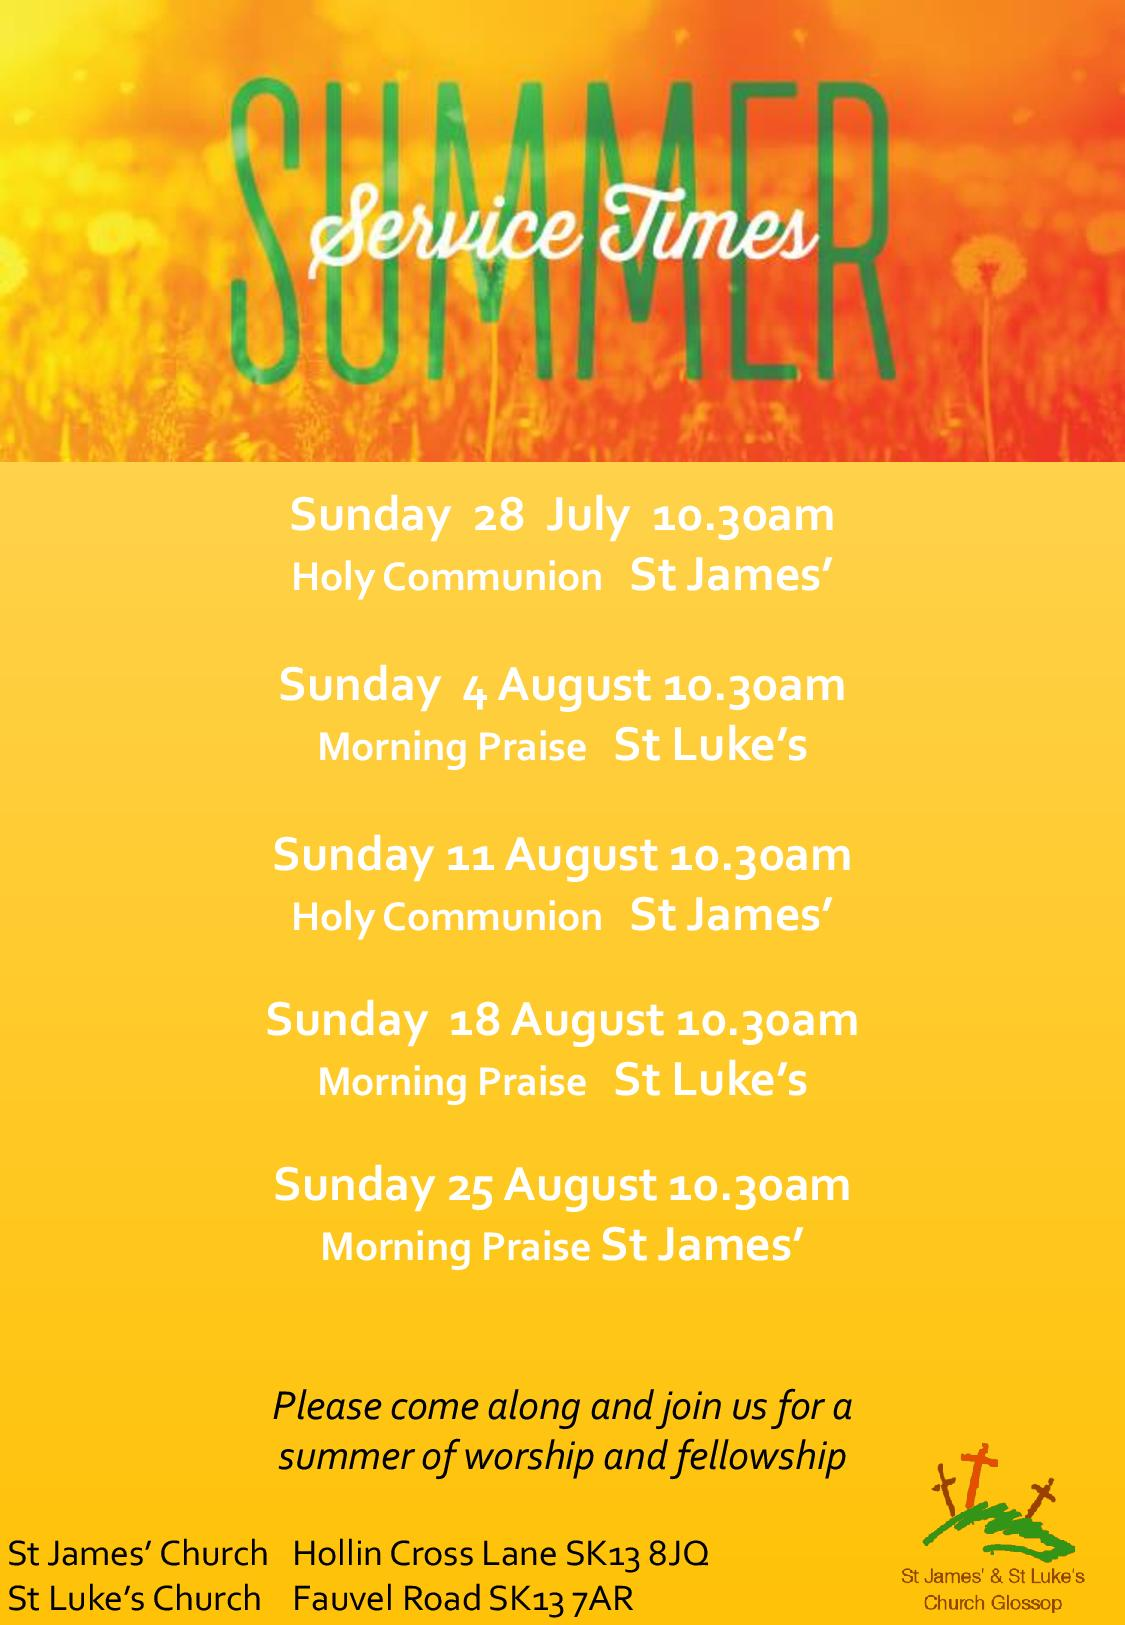 Whitfield Parish – St James' and St Luke's Church Glossop